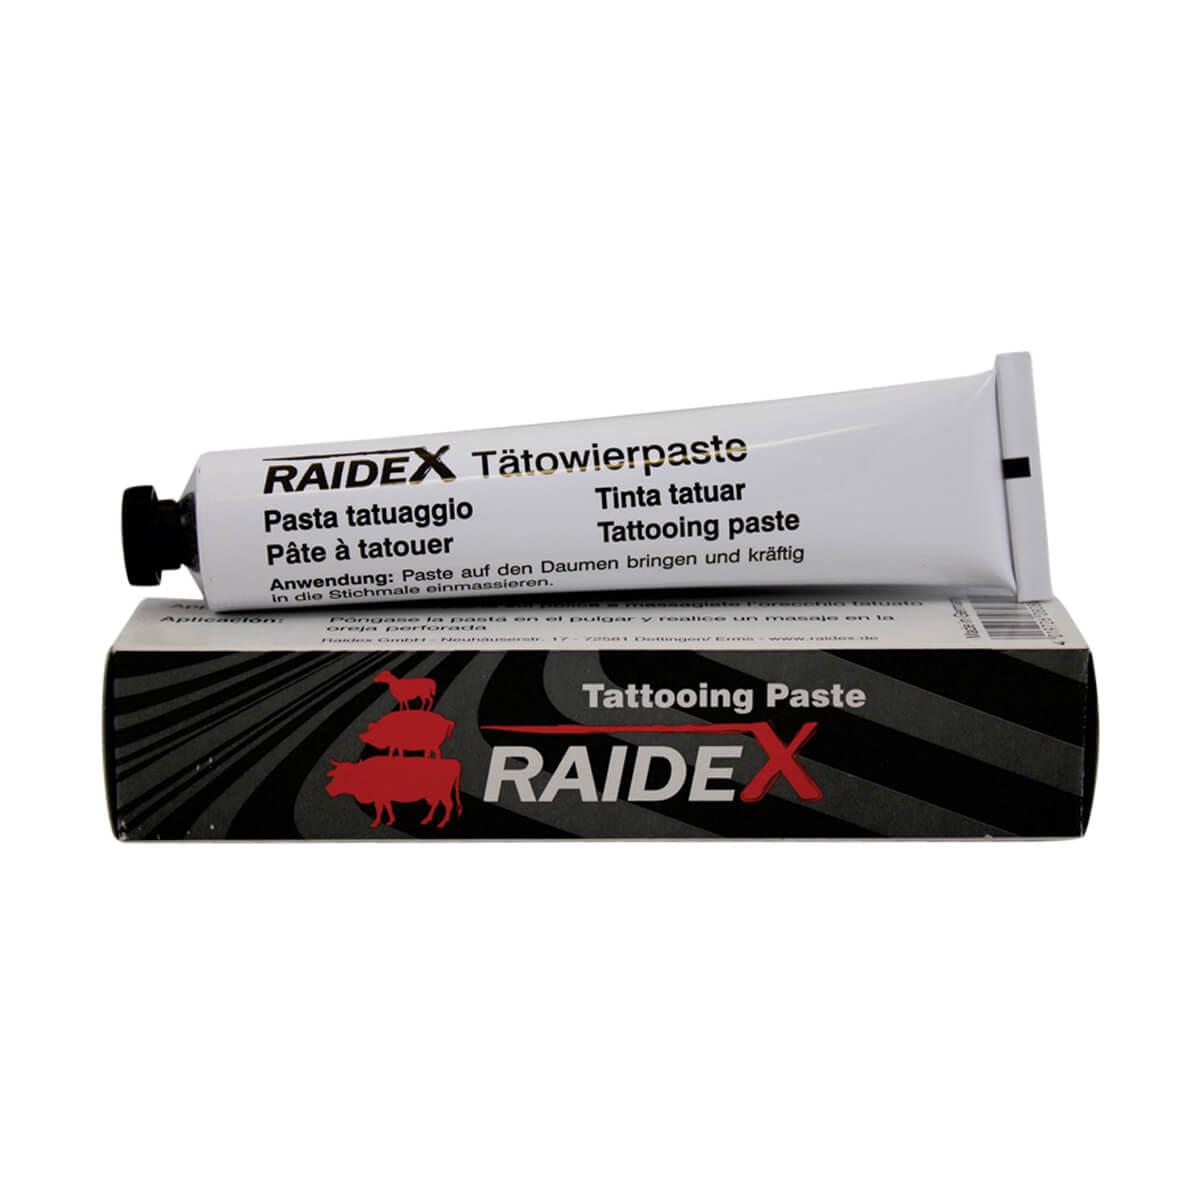 Raidex Tattoo Paste Tube - Black - 60g